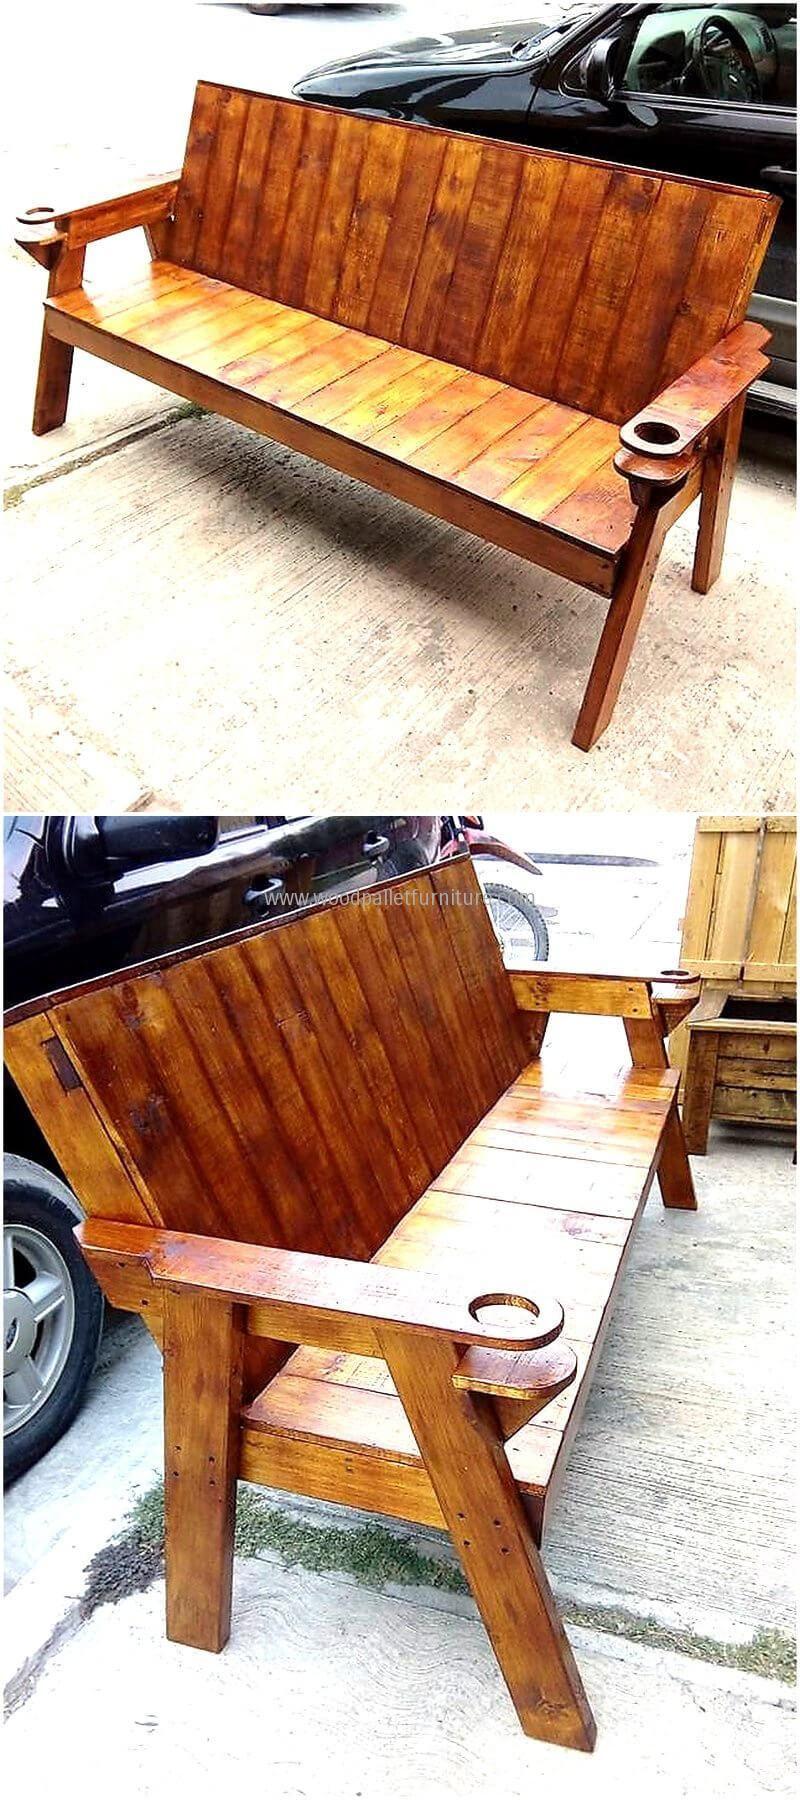 repurposed wood pallet bench   Madera   Pinterest   Bancos, Madera y ...